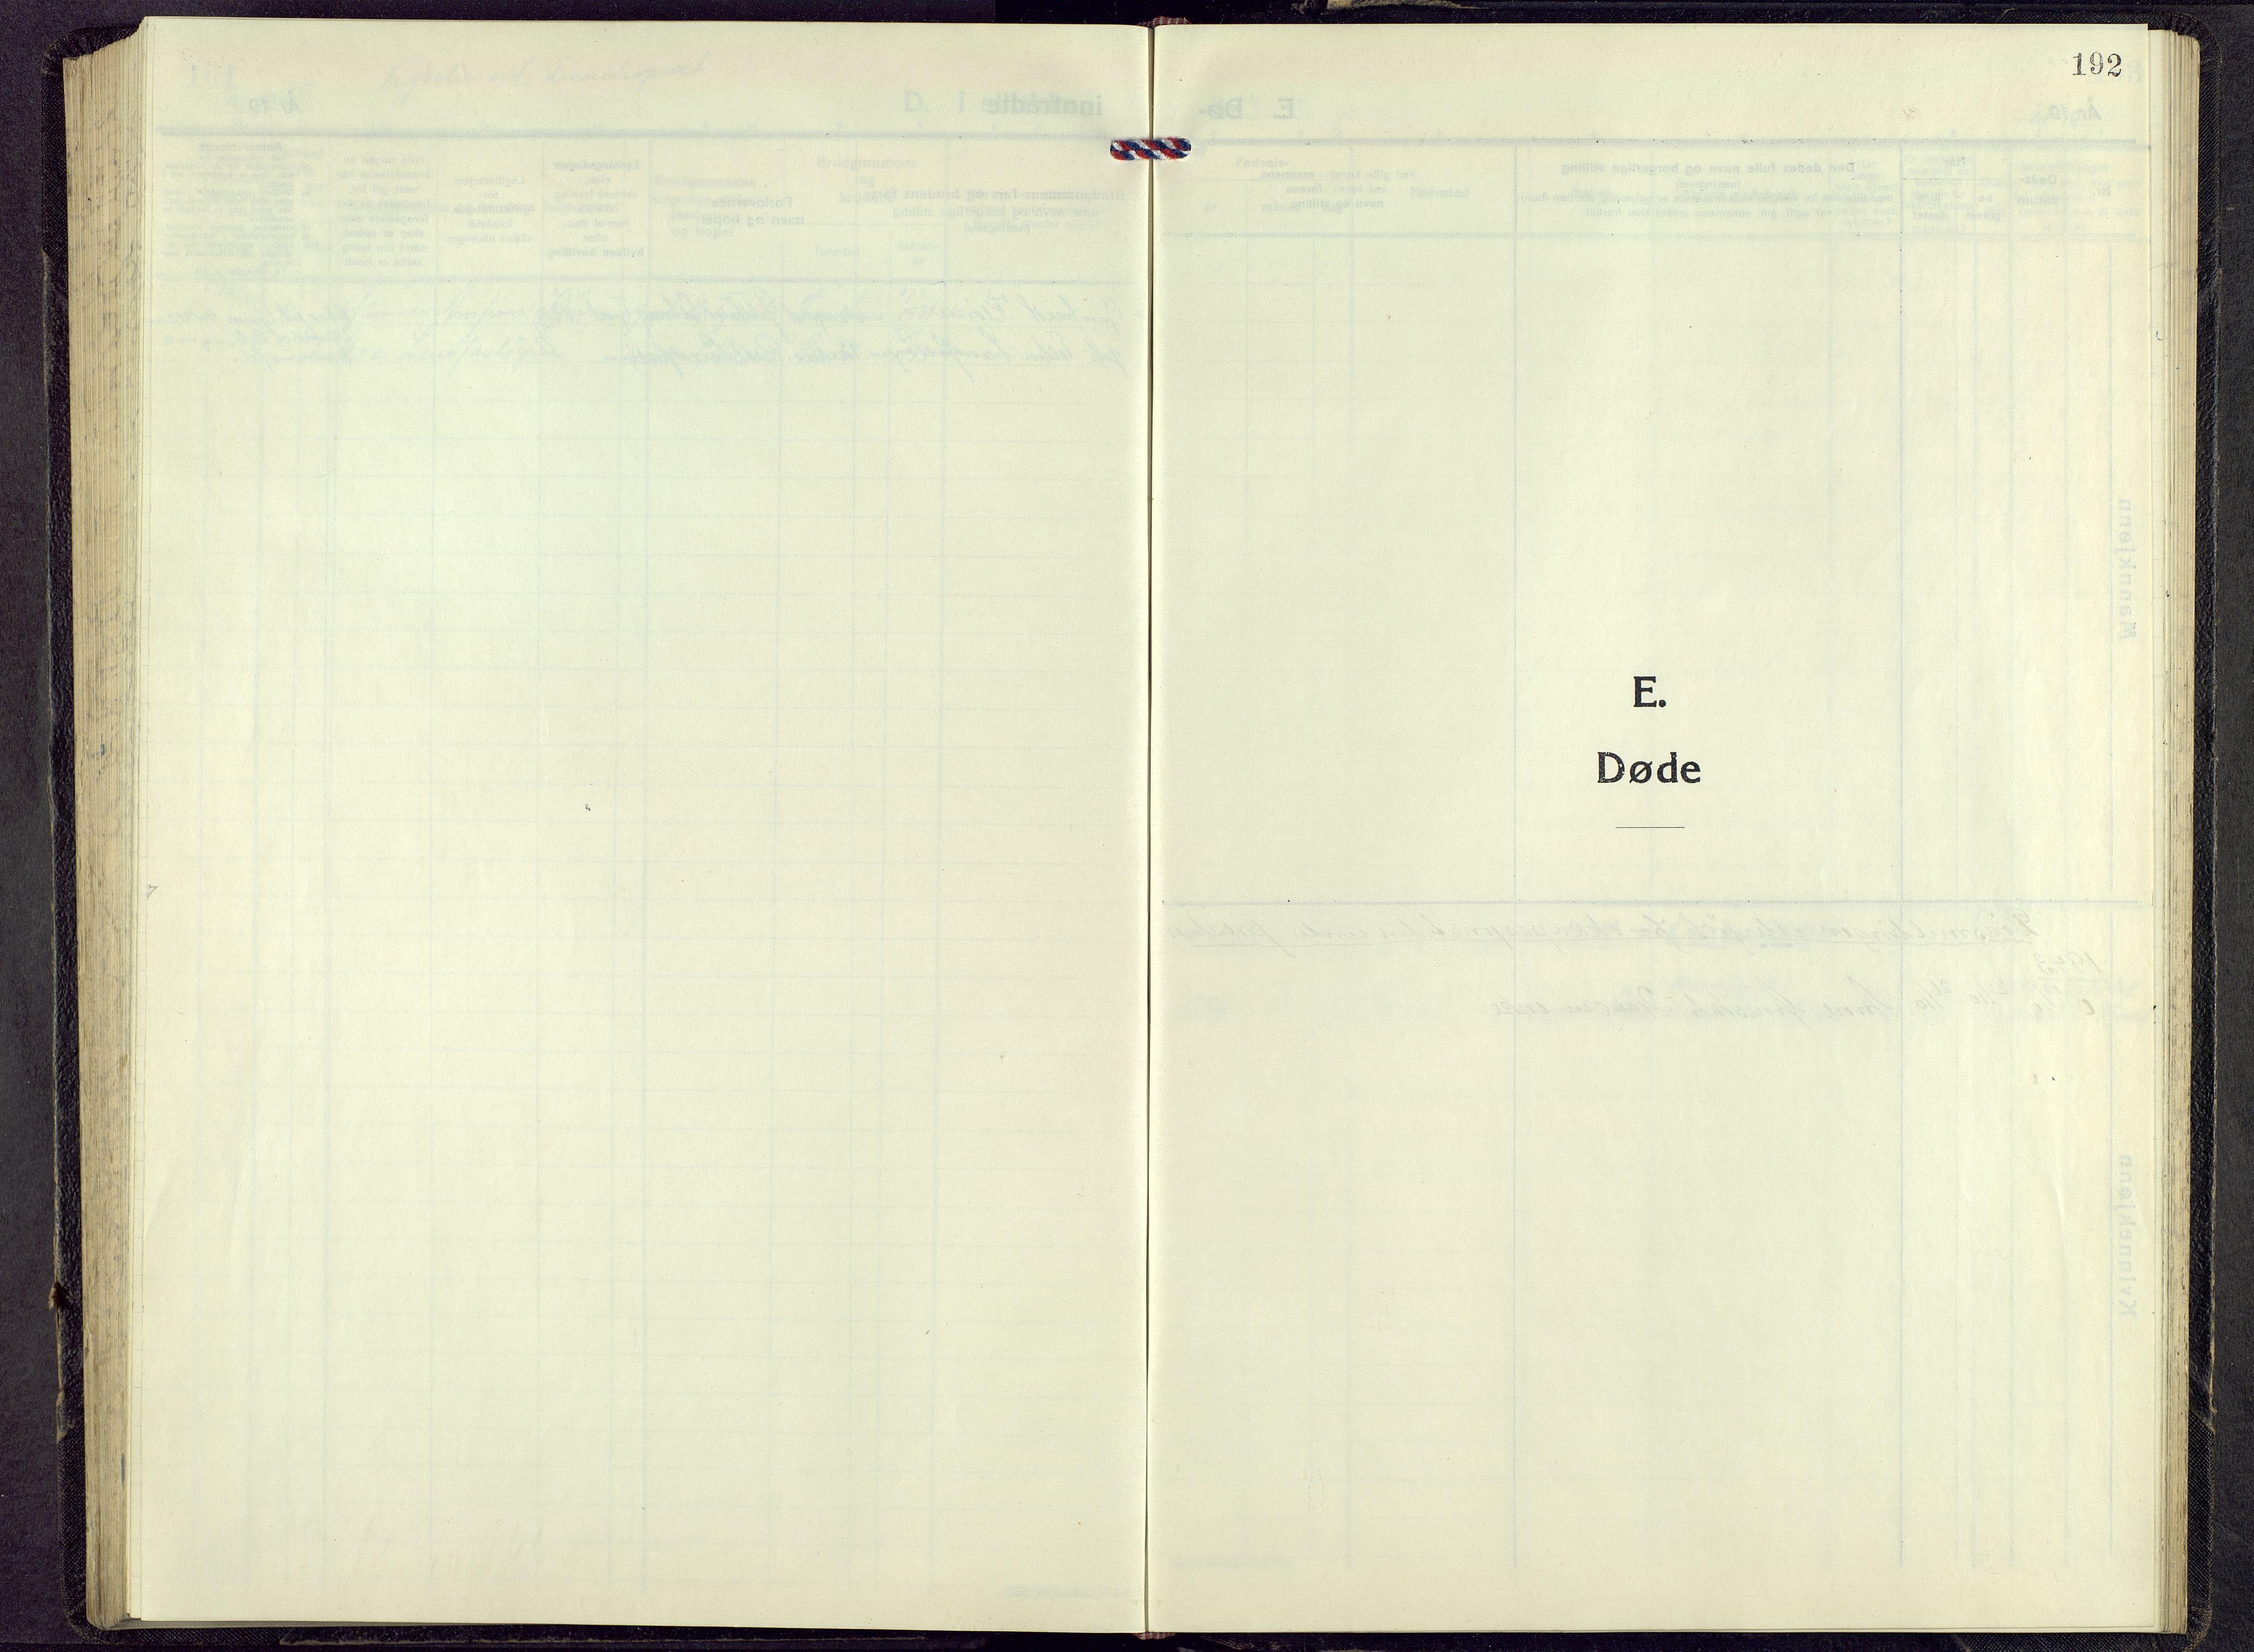 SAH, Alvdal prestekontor, Klokkerbok nr. 9, 1946-1965, s. 191b-192a